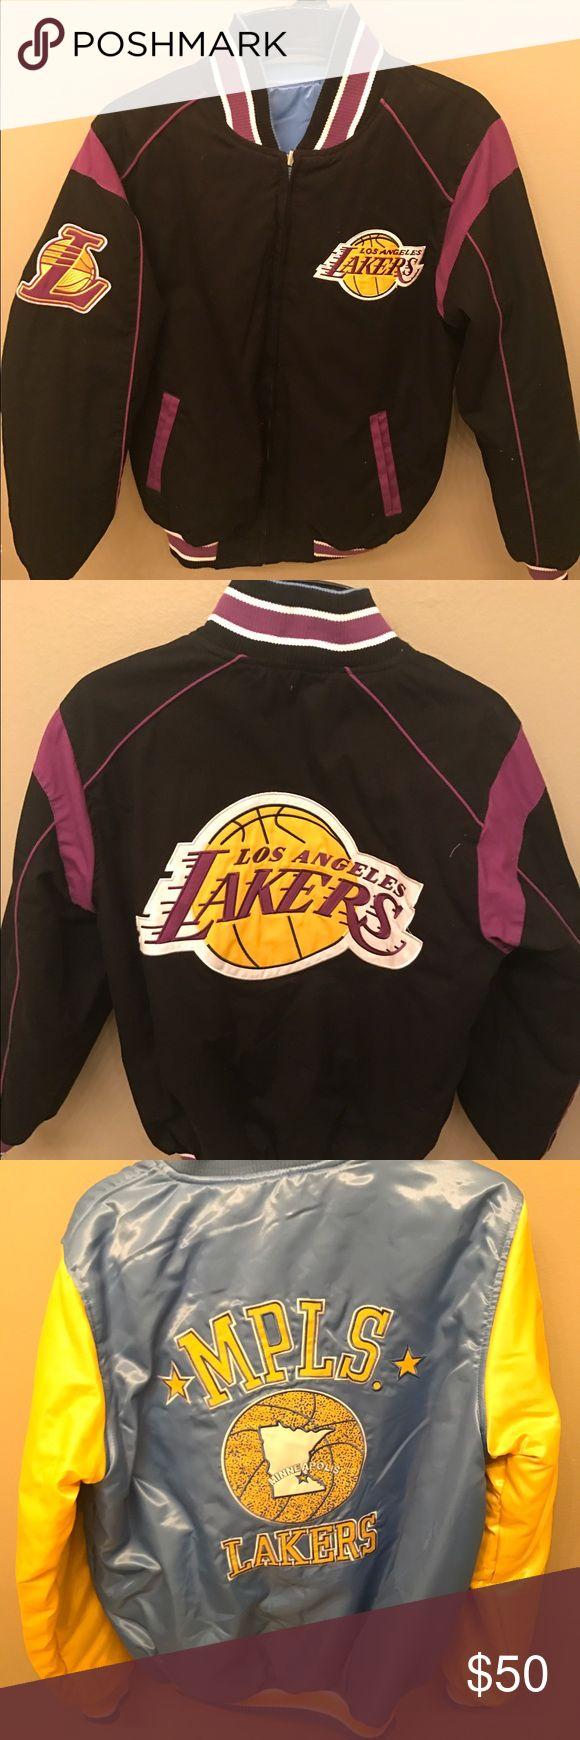 Size small Reversible lakers jacket Size small. Lightly worn. Jackets & Coats Bomber & Varsity